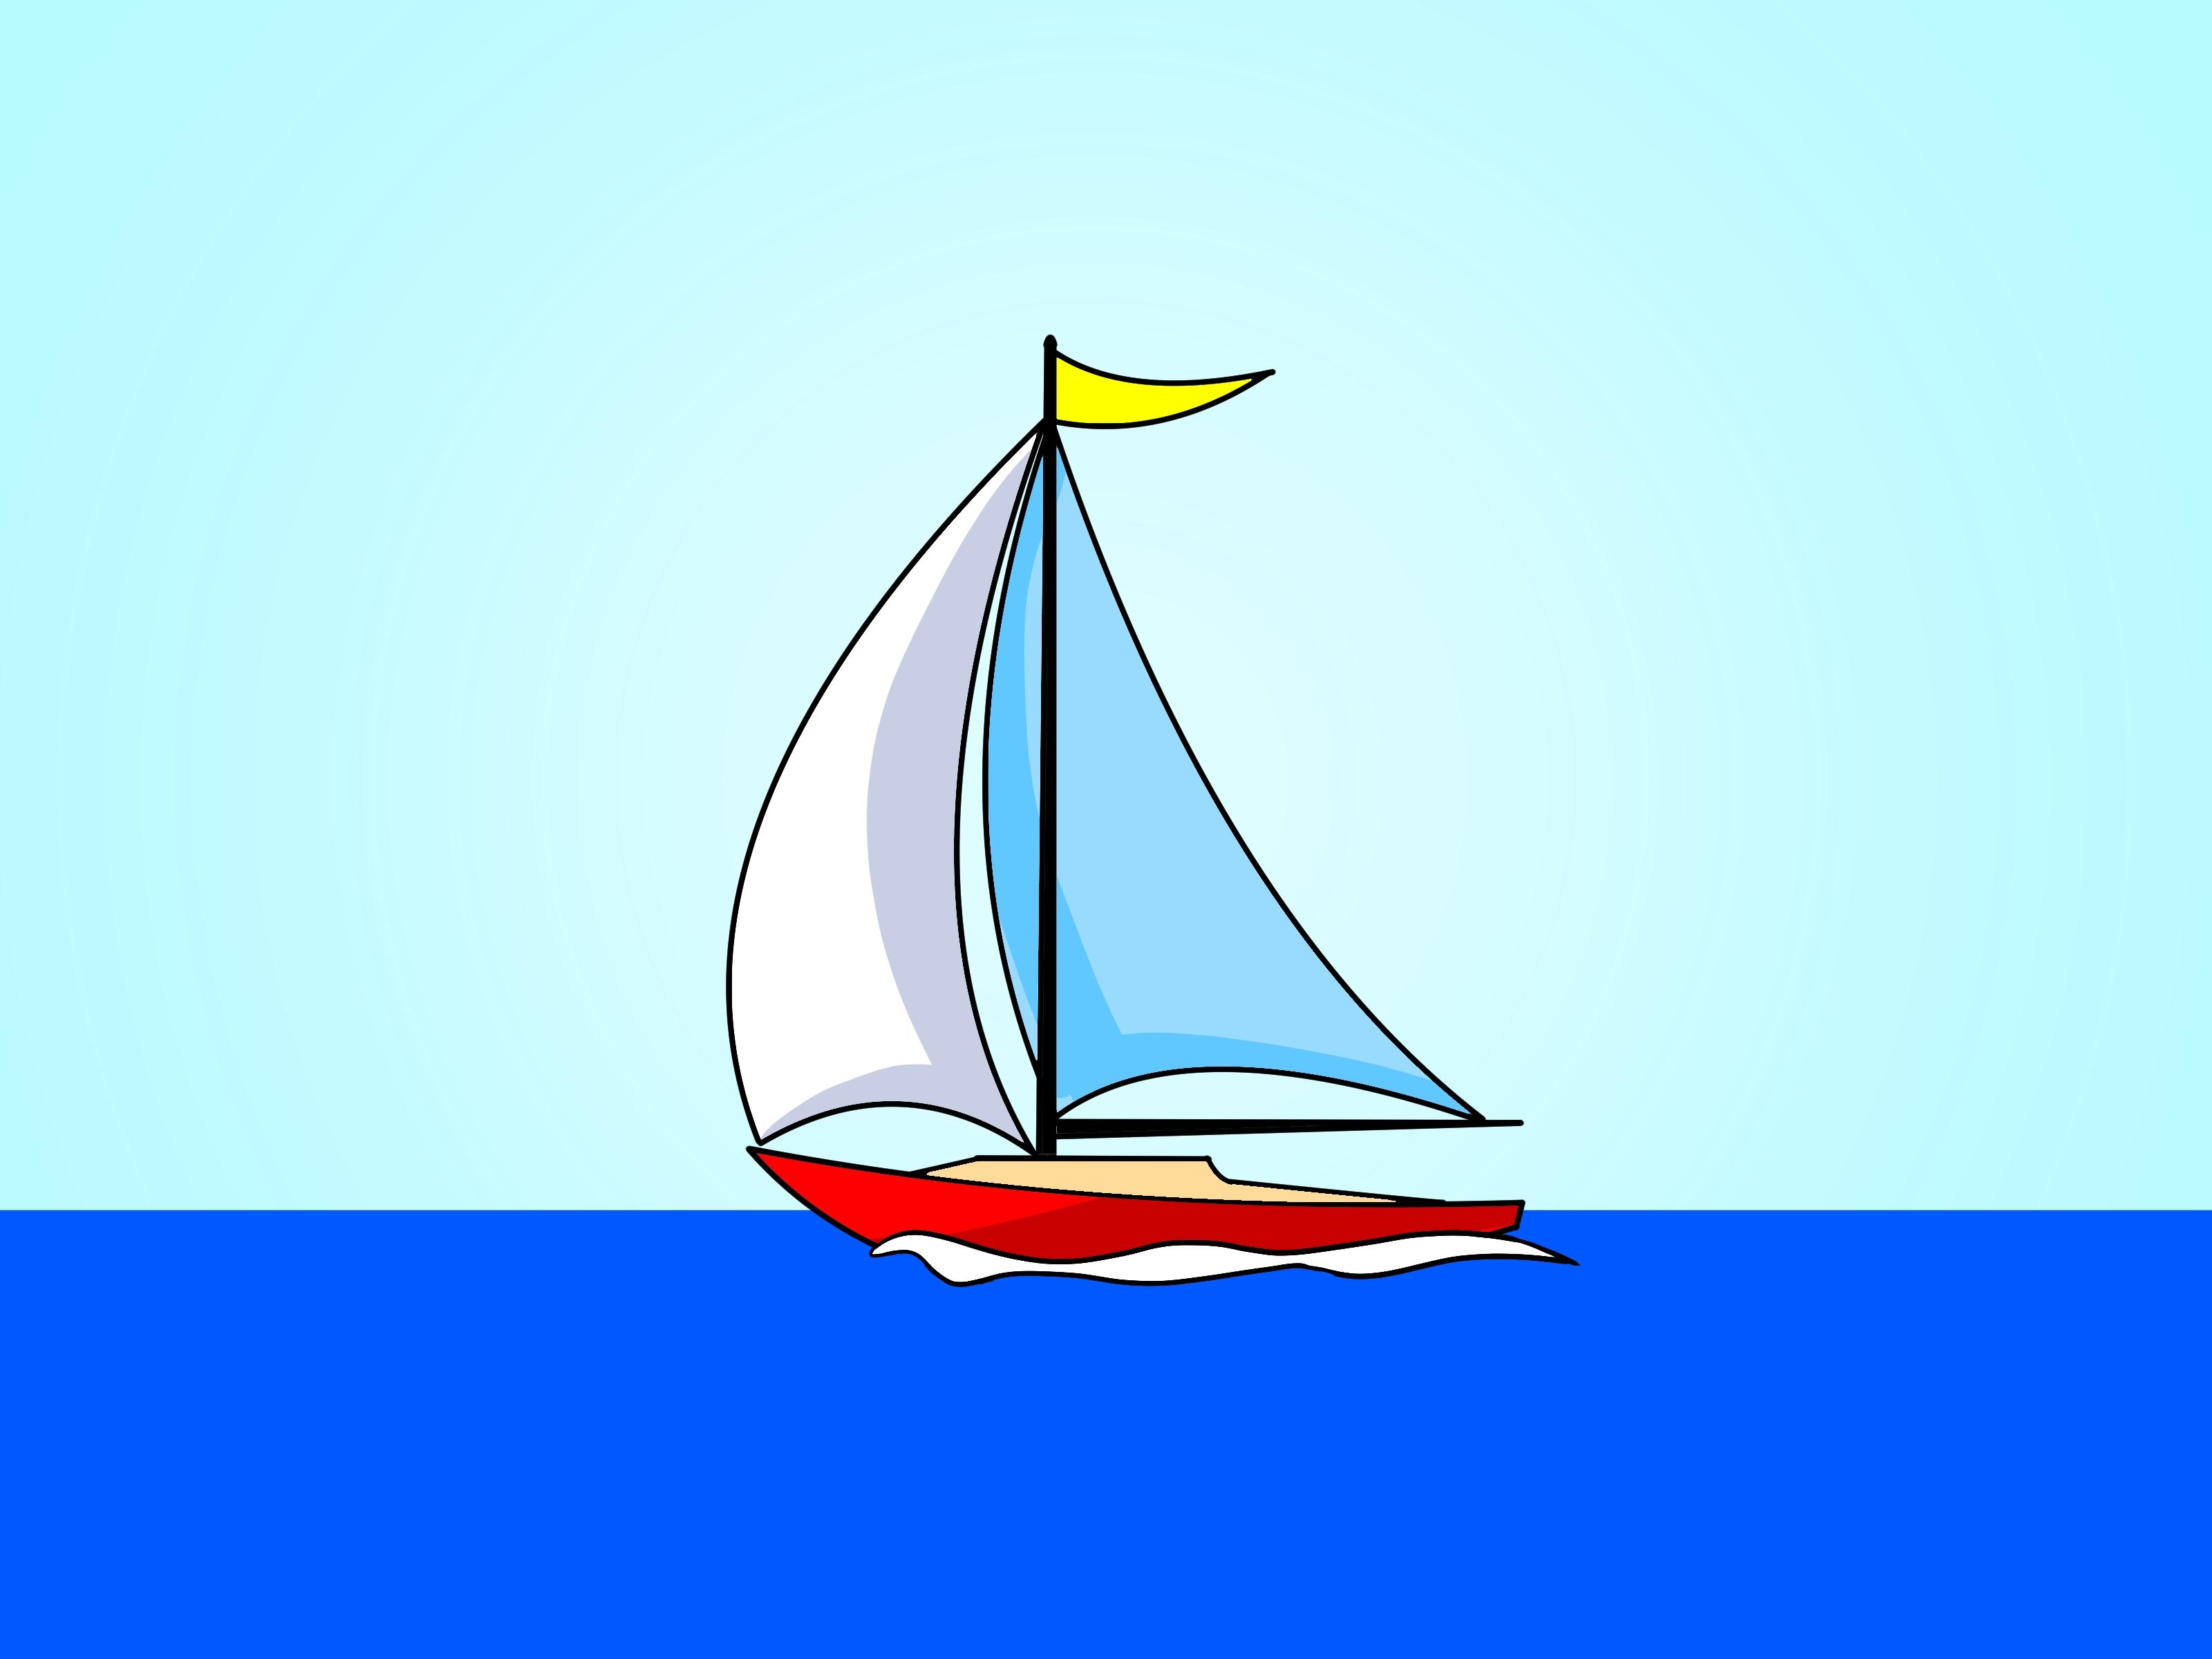 Sailboat clipart dinghy #12